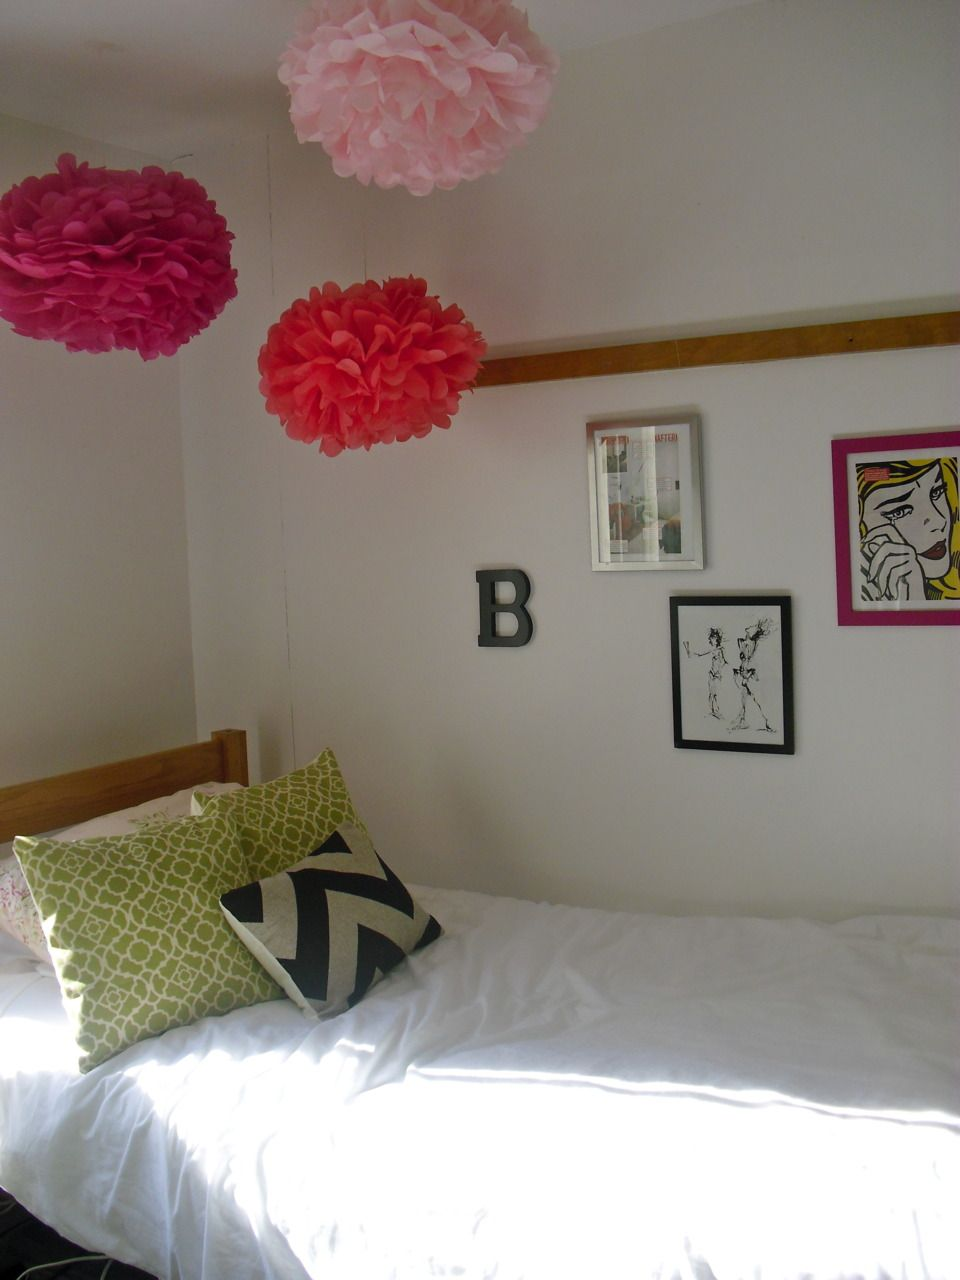 Shantamichelle Kirms My Dorm At Ndsu I Wish I Know How To Do Poms